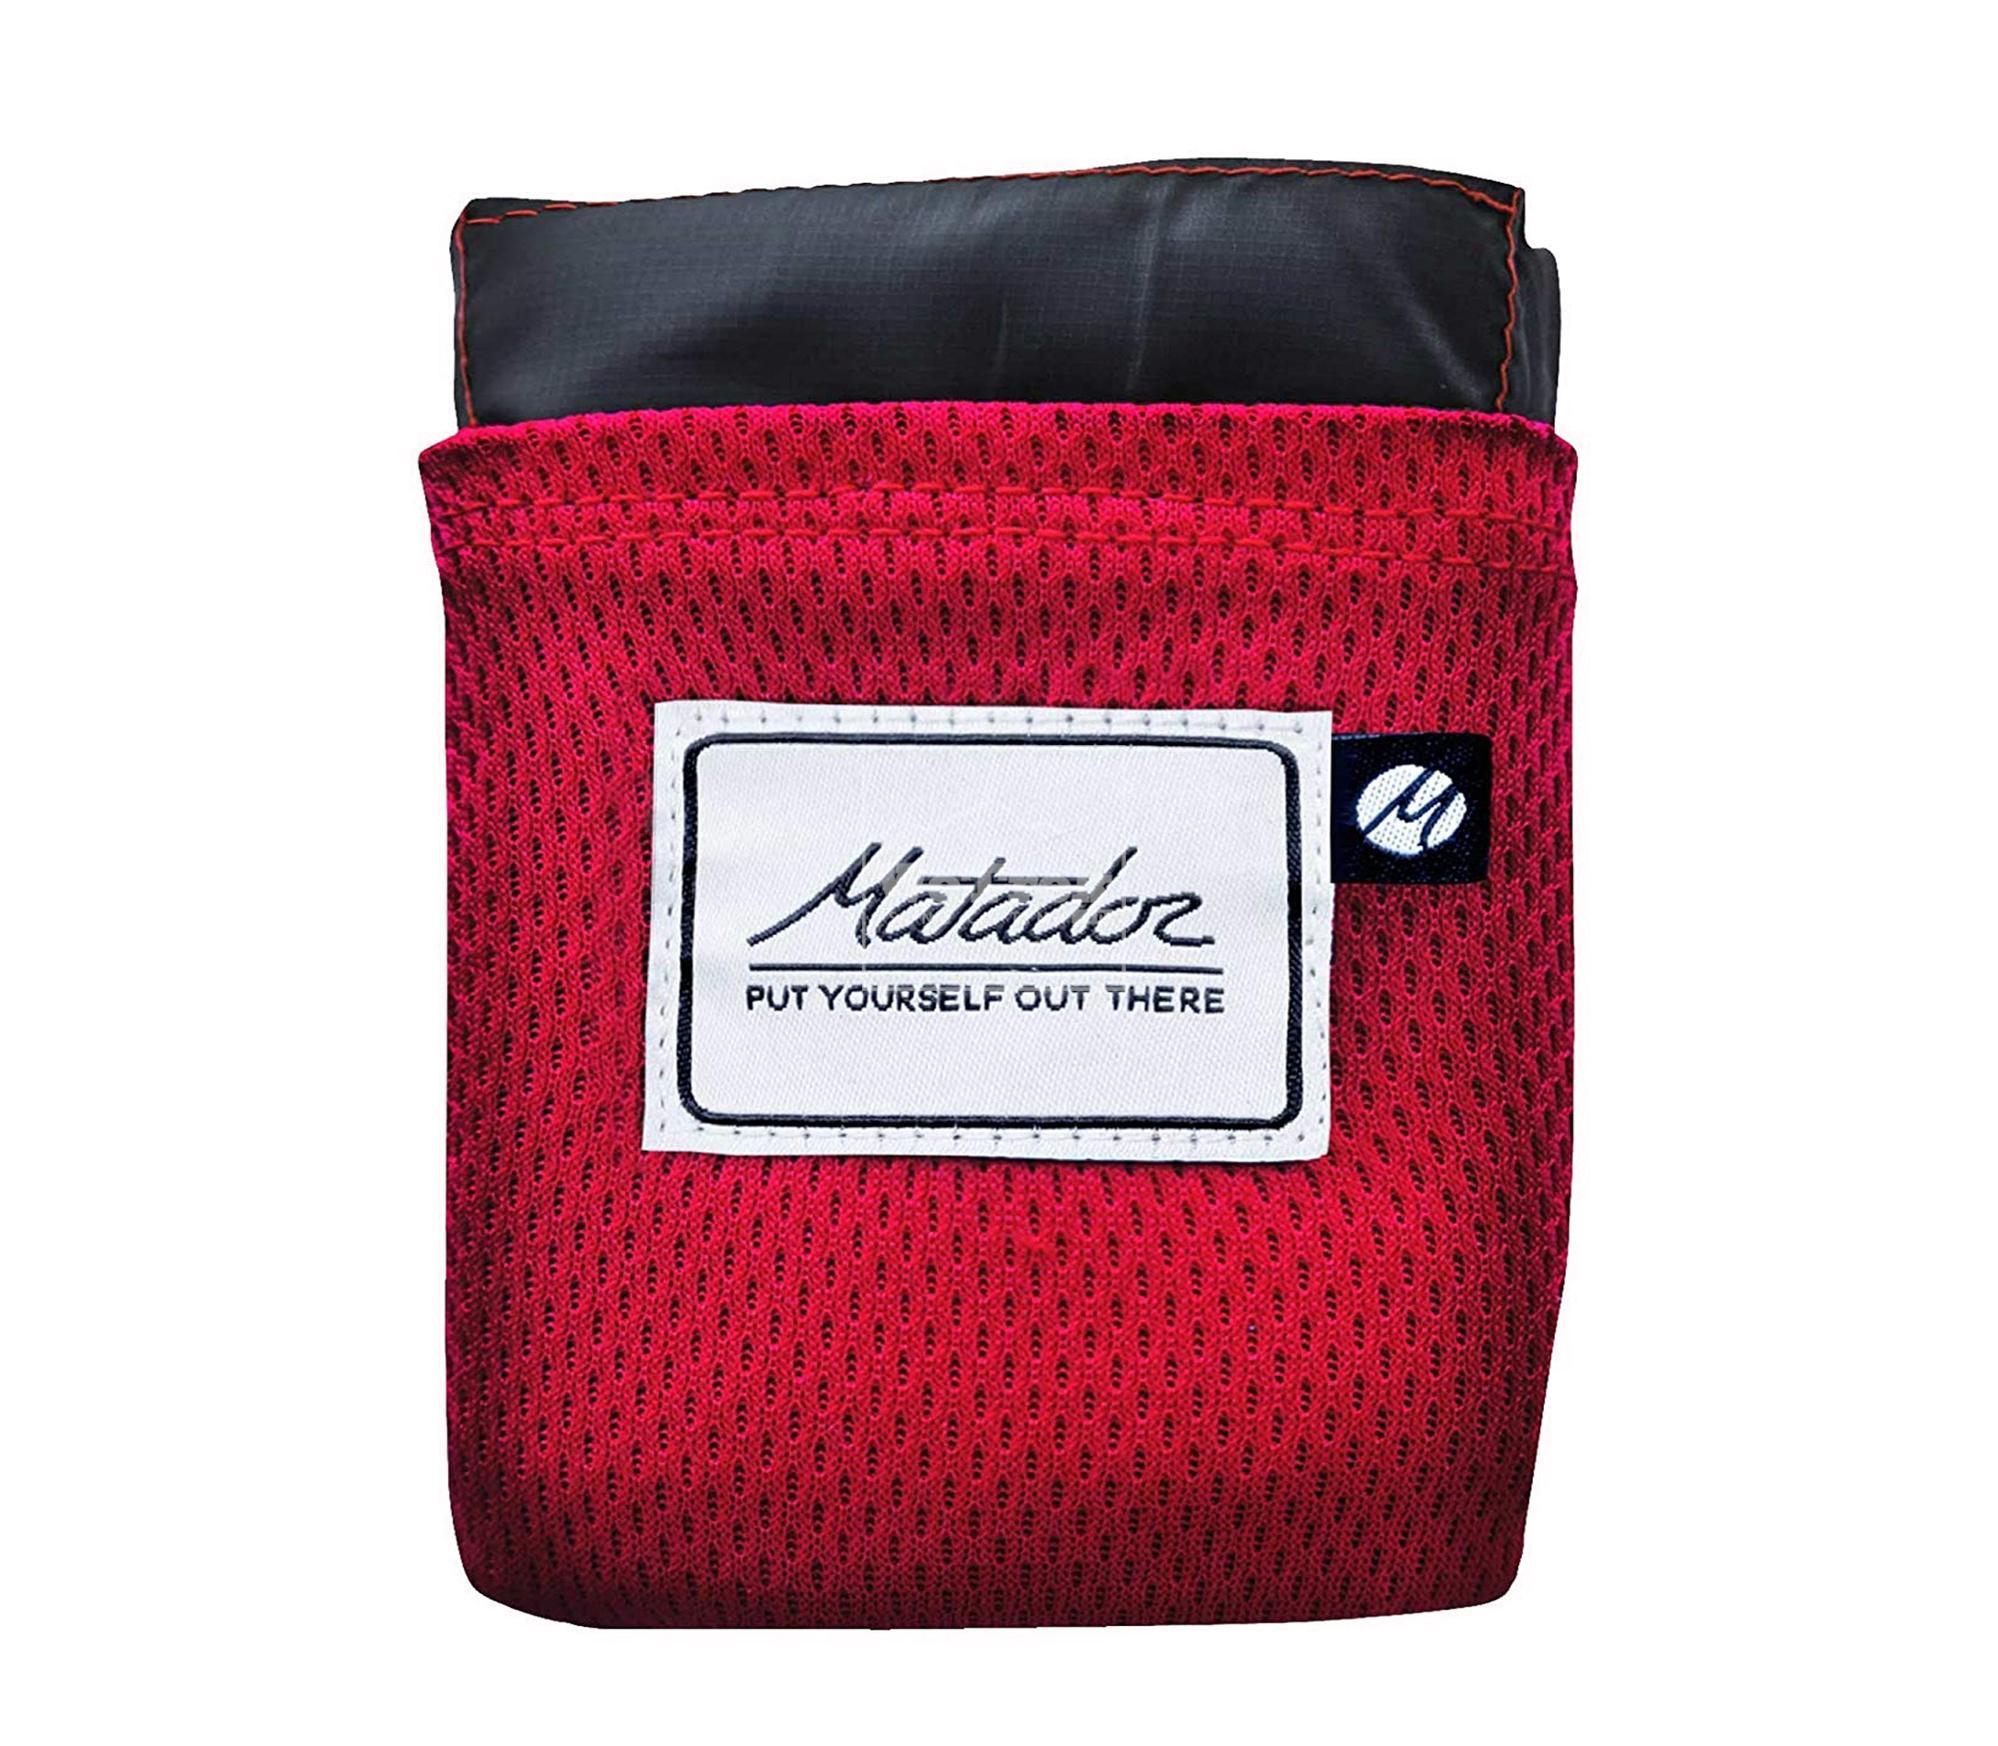 Tấm trải du lịch Matador Pocket Blanket - 8324 Red